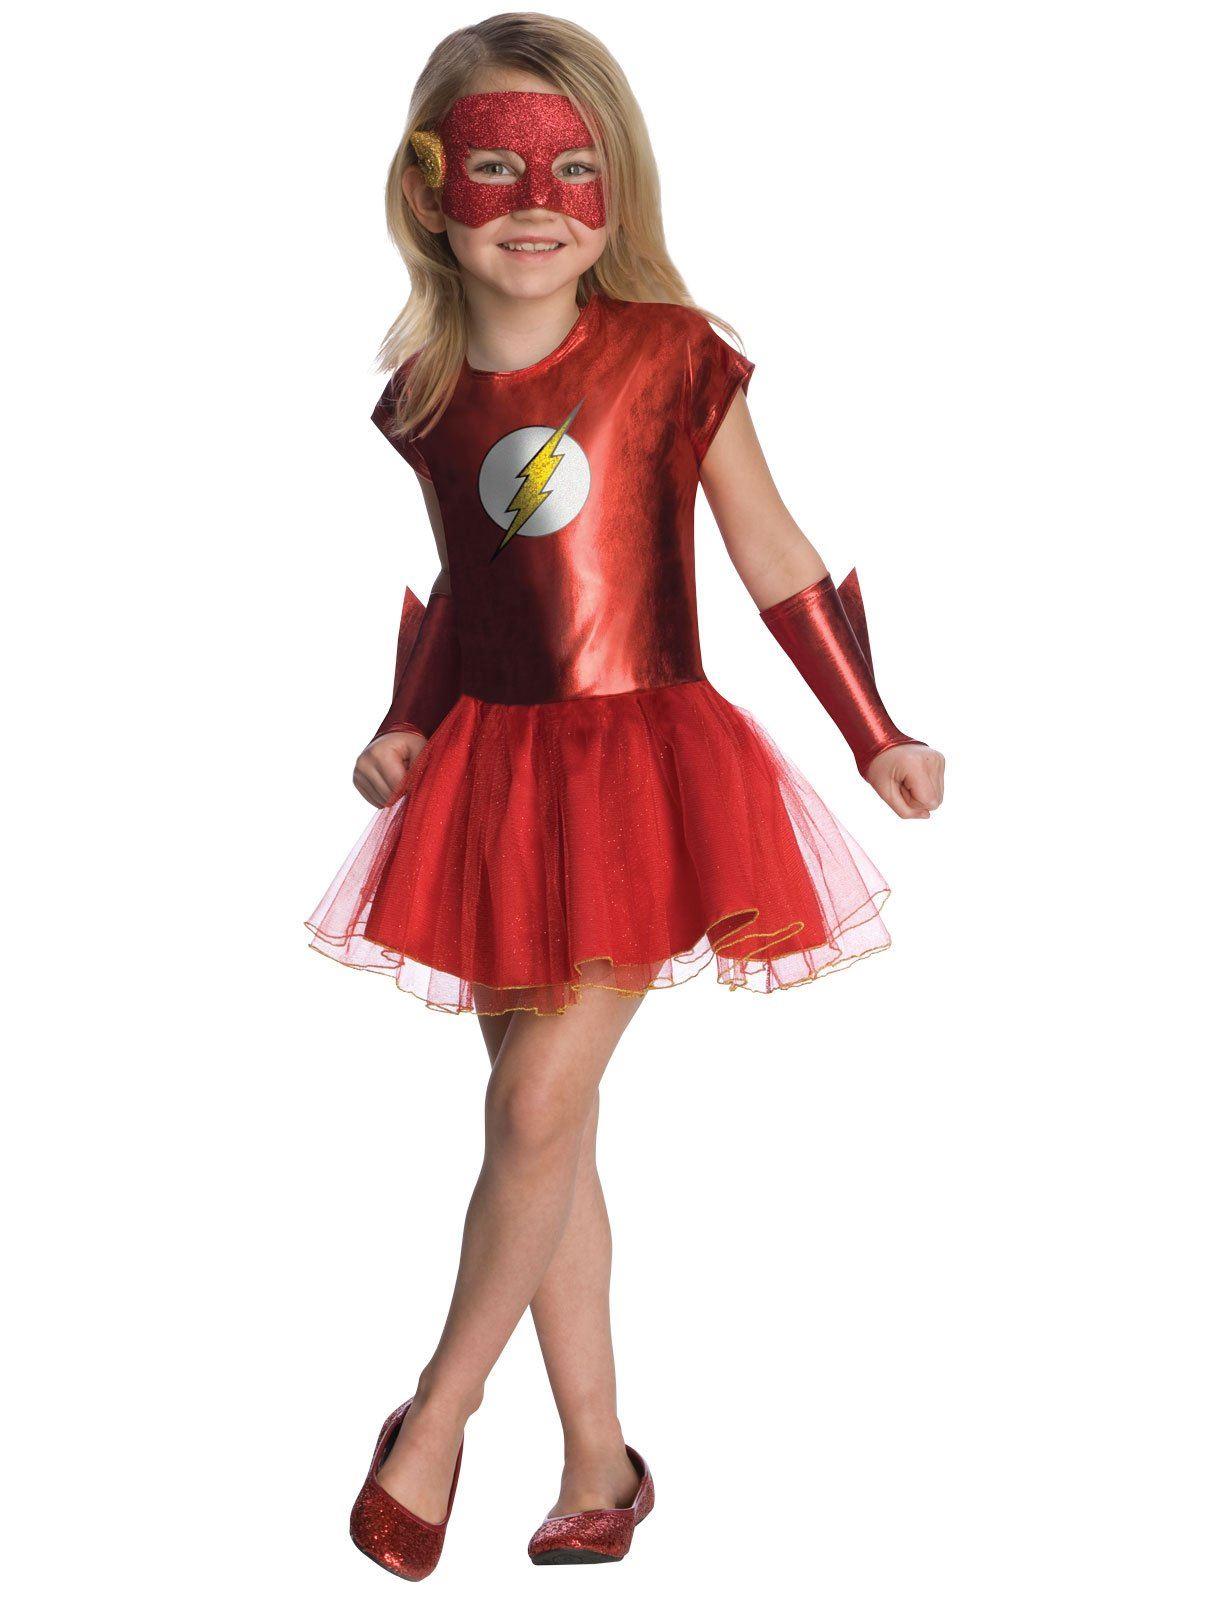 Kids Flash Girls Costume 24 99 The Costume Land